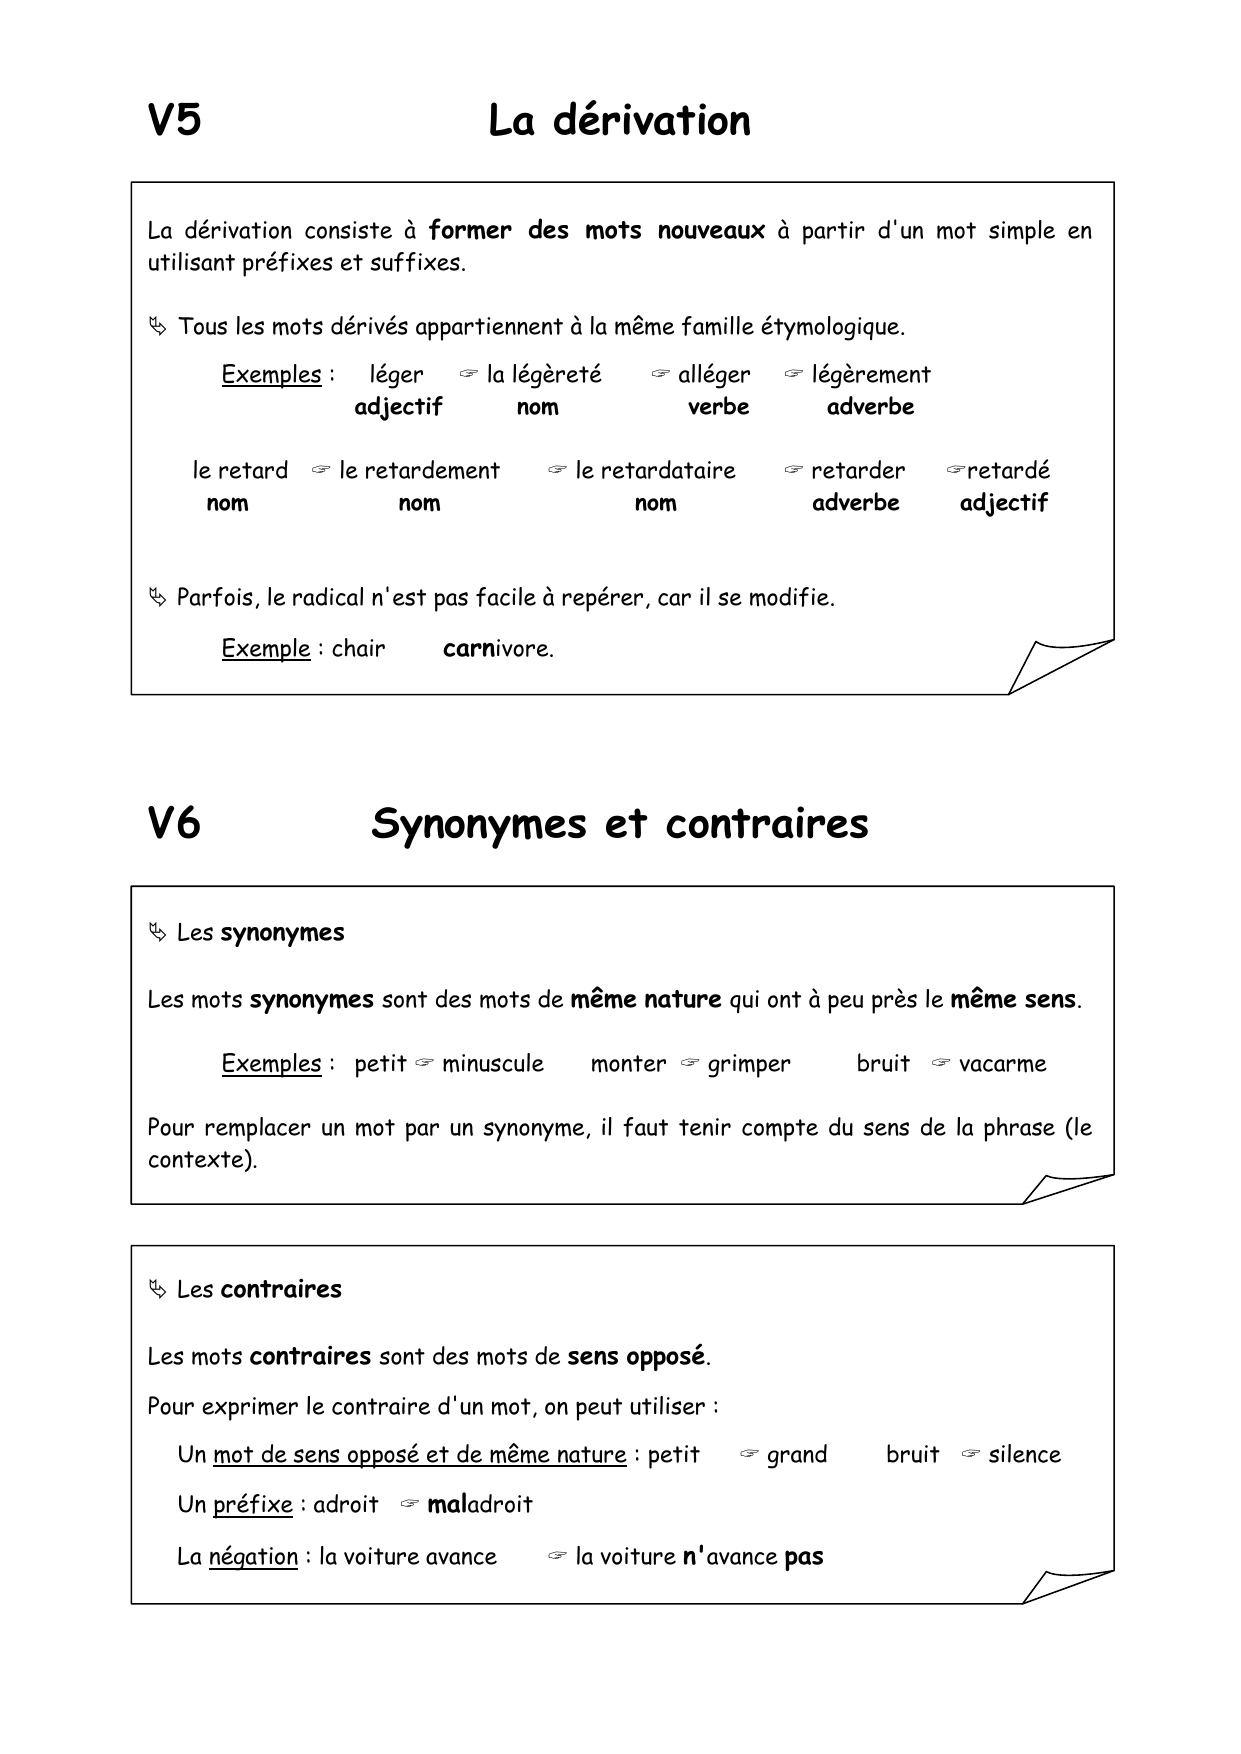 V5 La Derivation V6 Synonymes Et Contraires